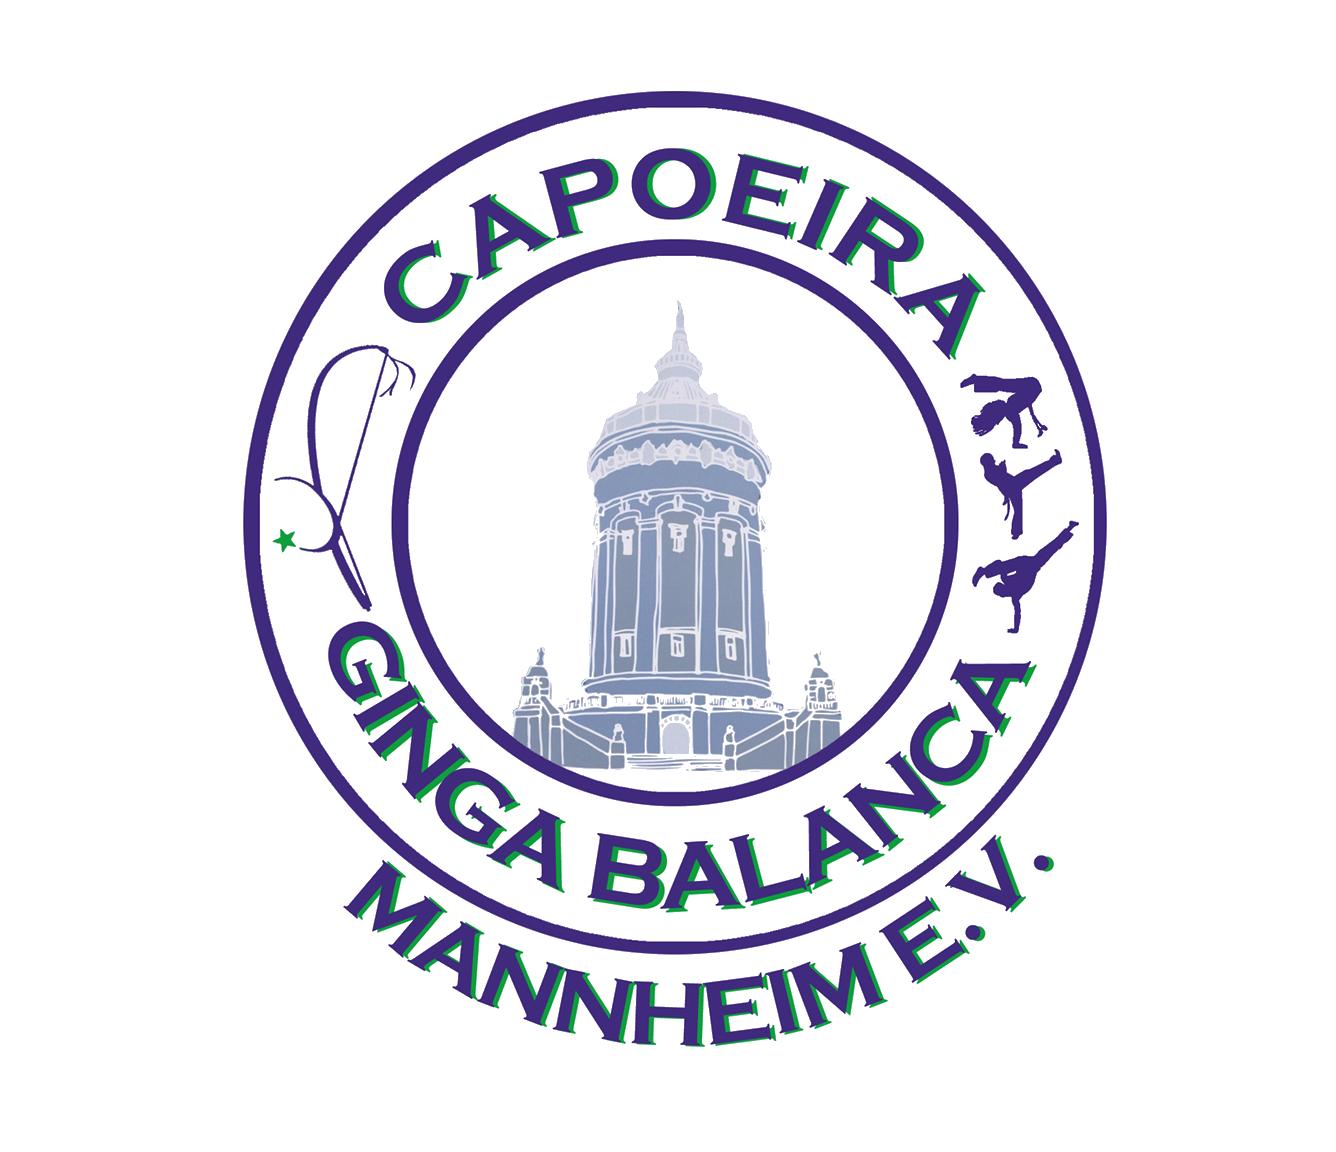 Capoeira in Mannheim